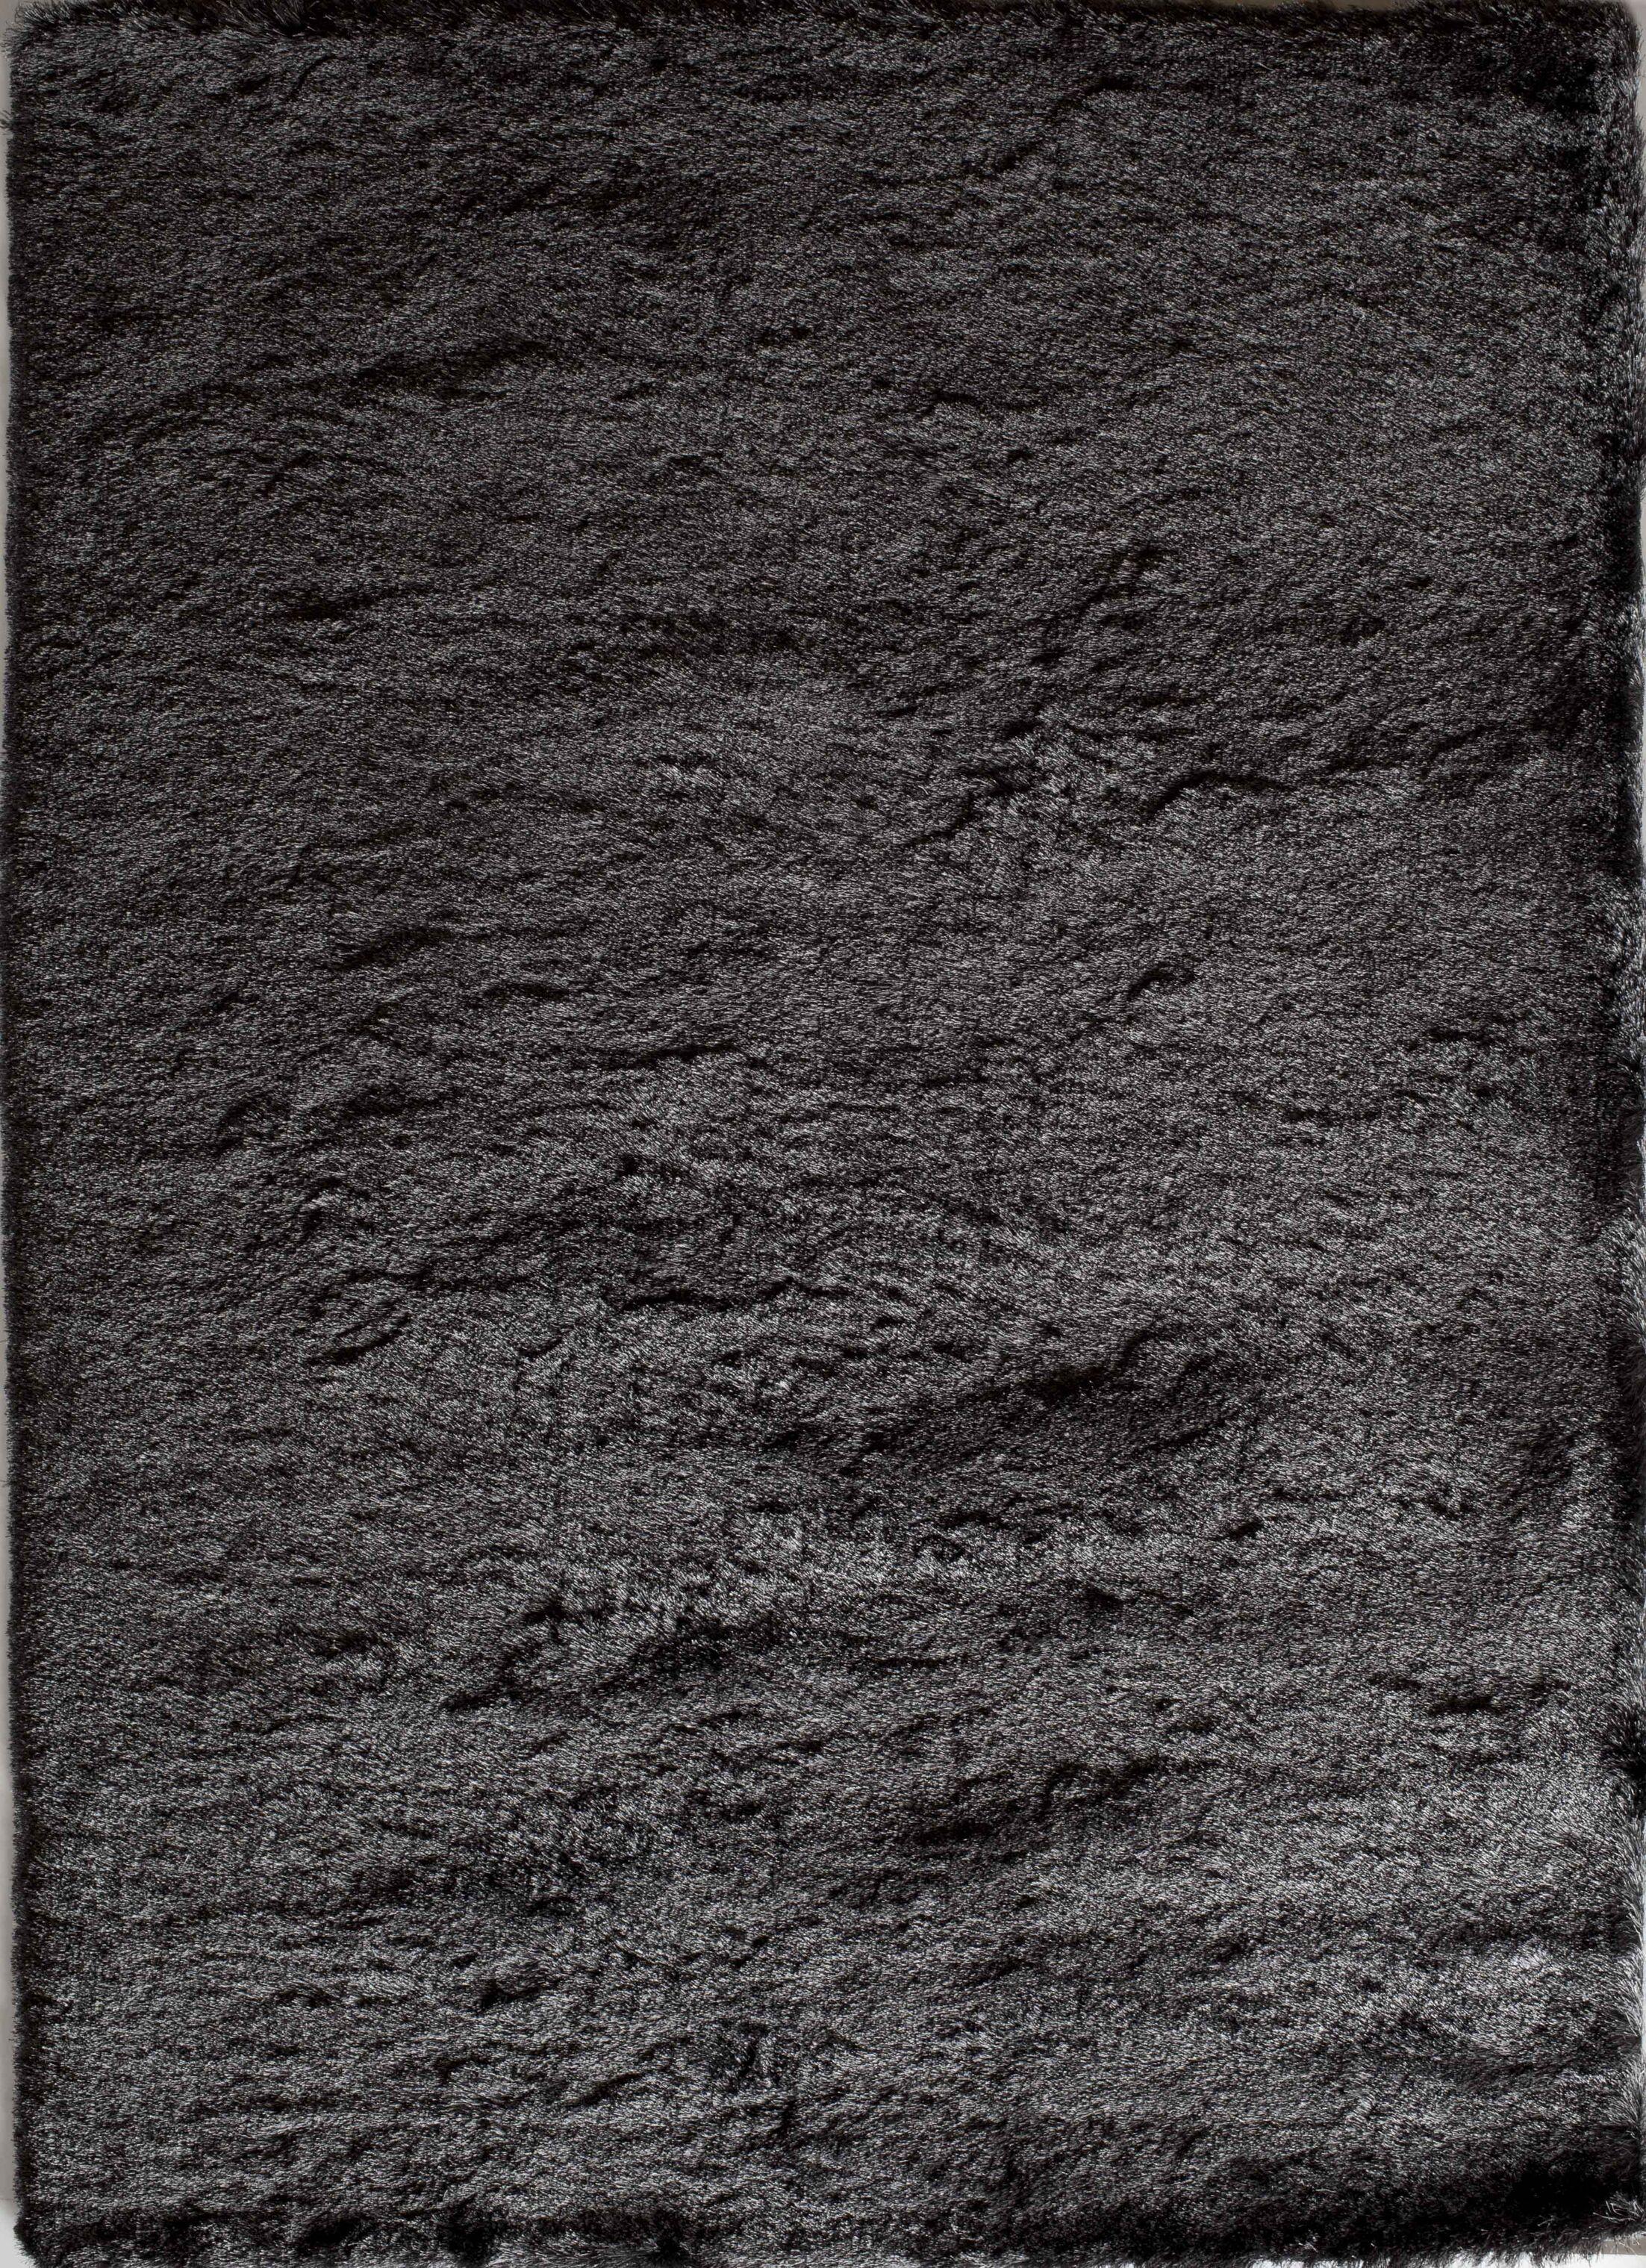 Gray Area Rug Rug Size: Rectangle 7' x 9'